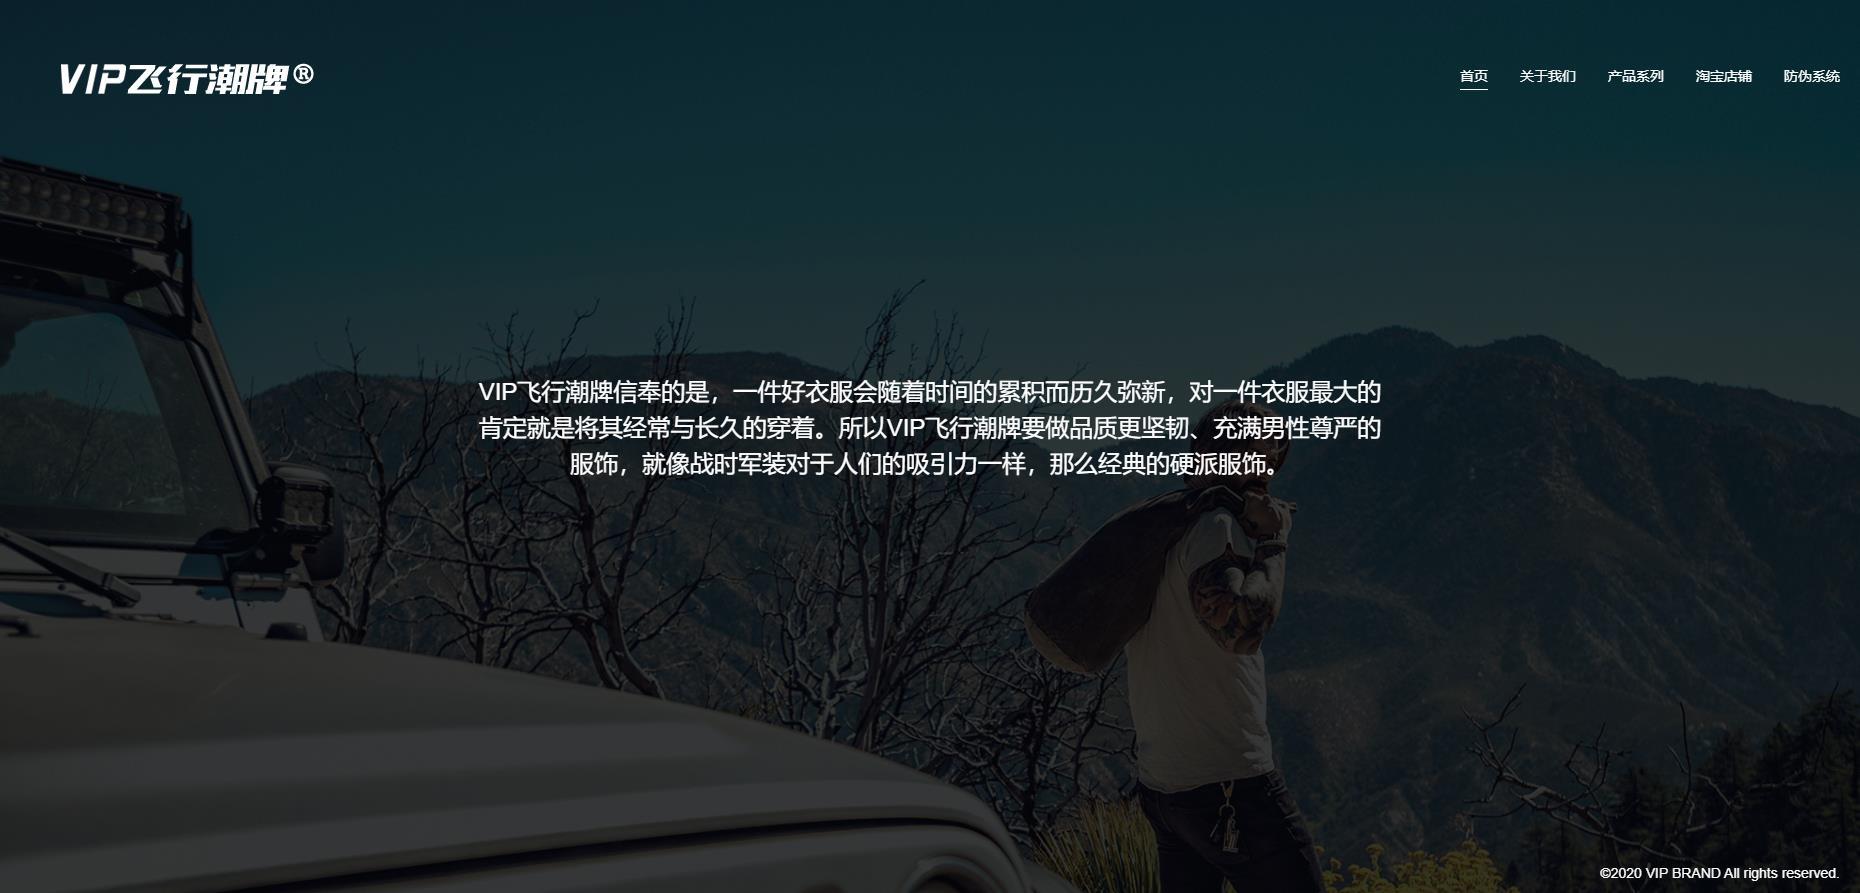 VIP飞行潮牌官网 VIP飞行潮牌官方旗舰店